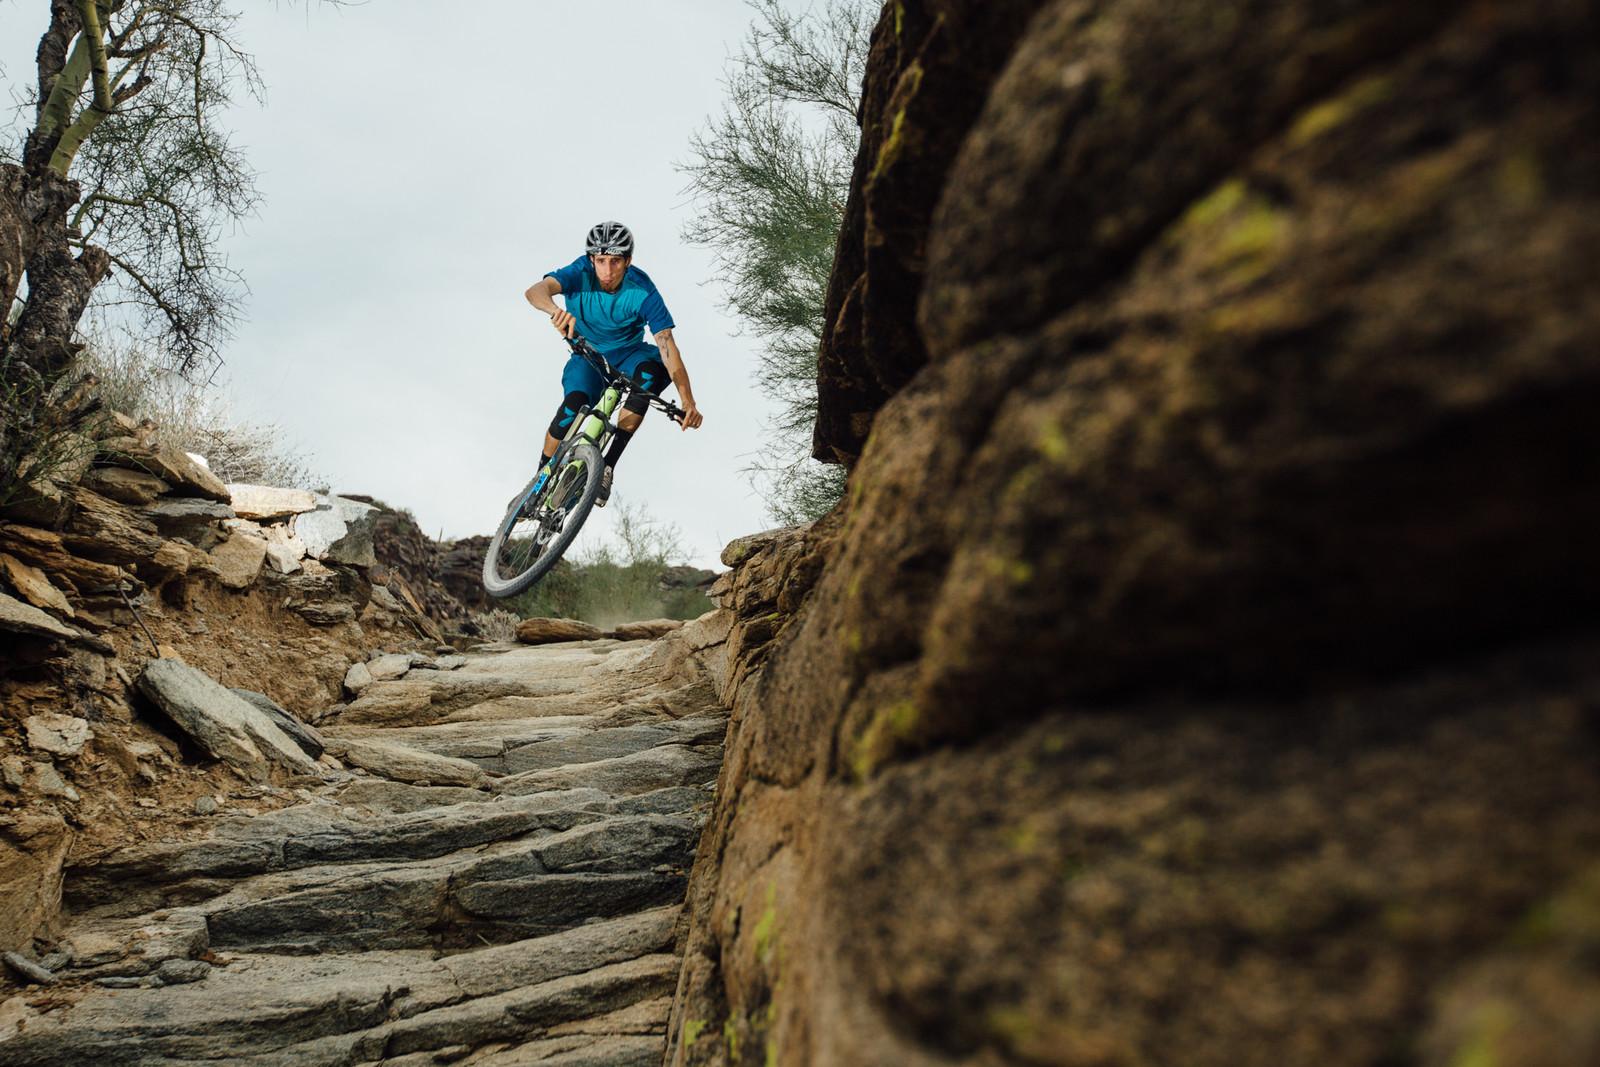 Scrubbin' - Just The Bangers - 2016 Vital MTB Test Sessions Photo Gallery - Mountain Biking Pictures - Vital MTB